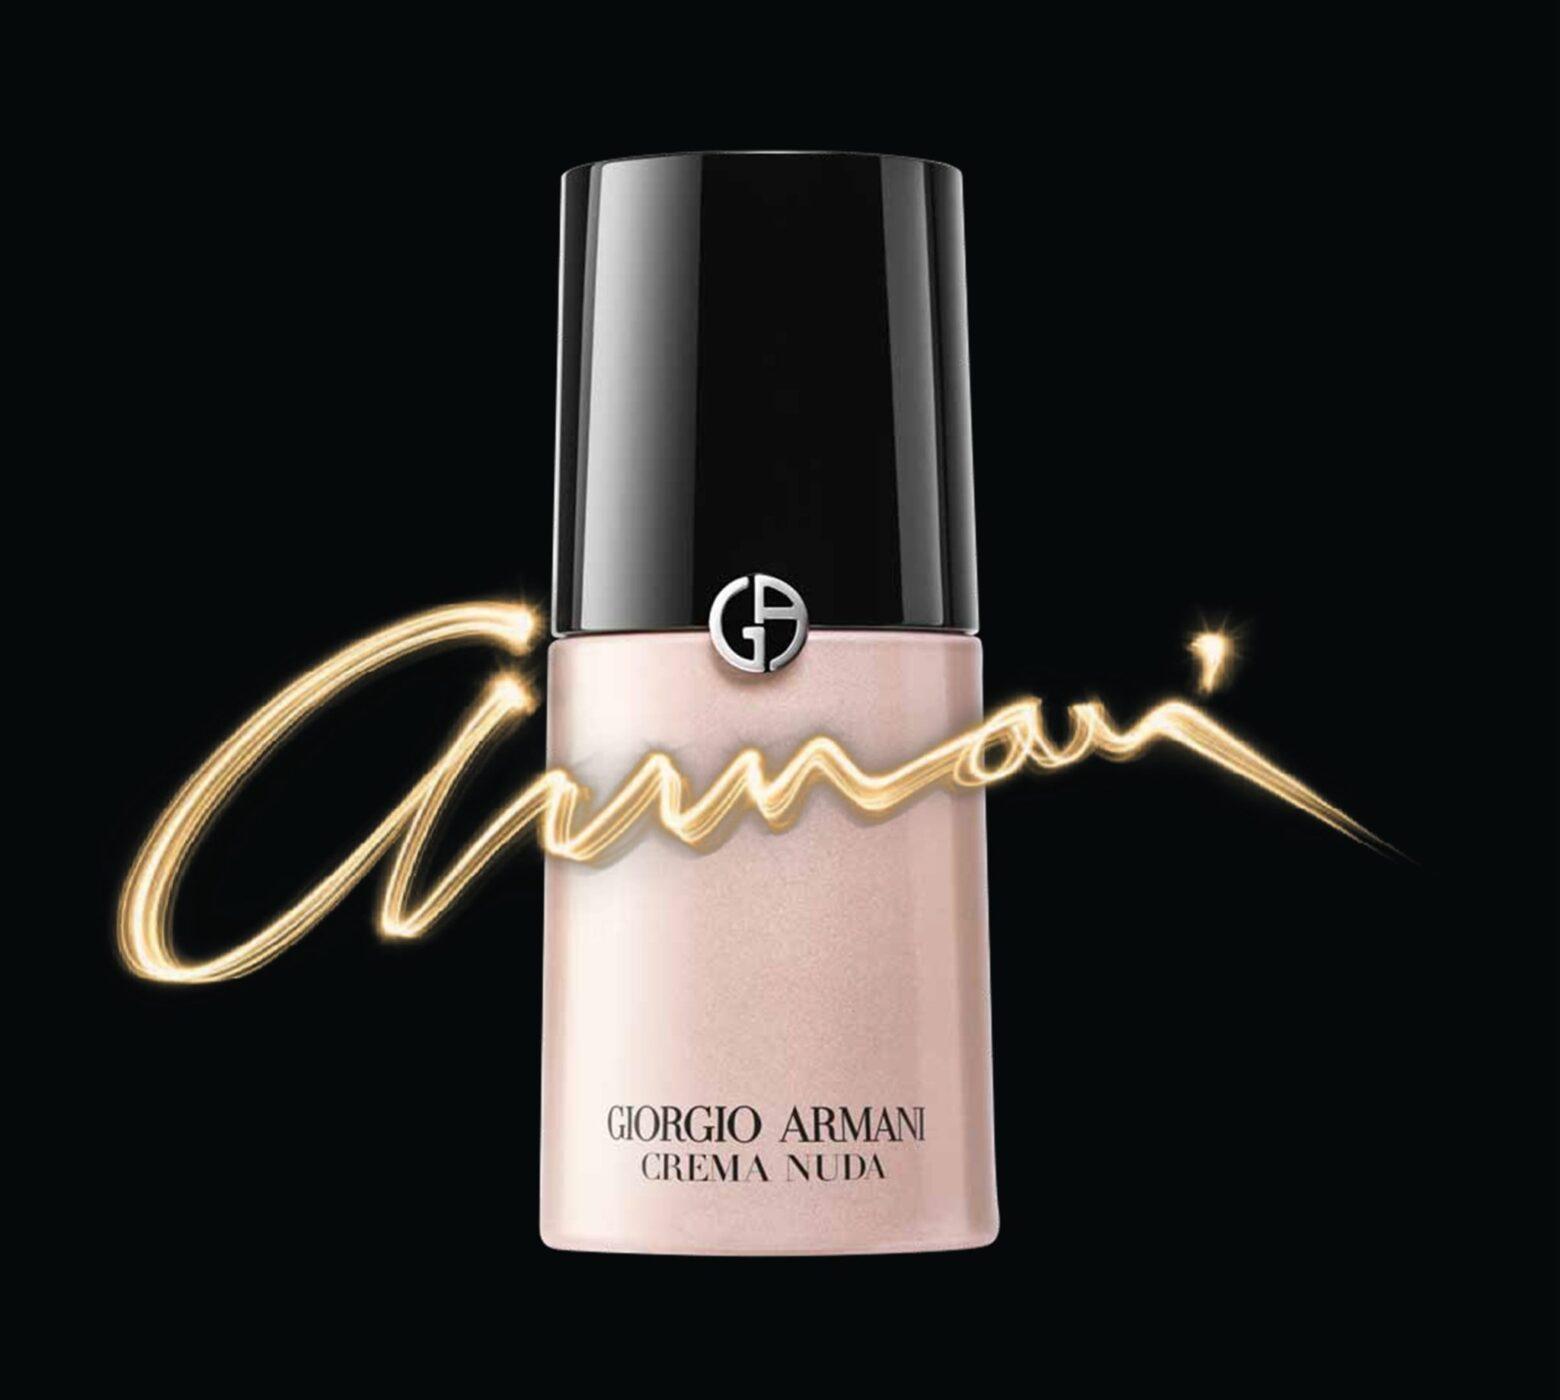 Giorgio Armani Beauty Night Light Holiday 2016 Collection | LES FAÇONS